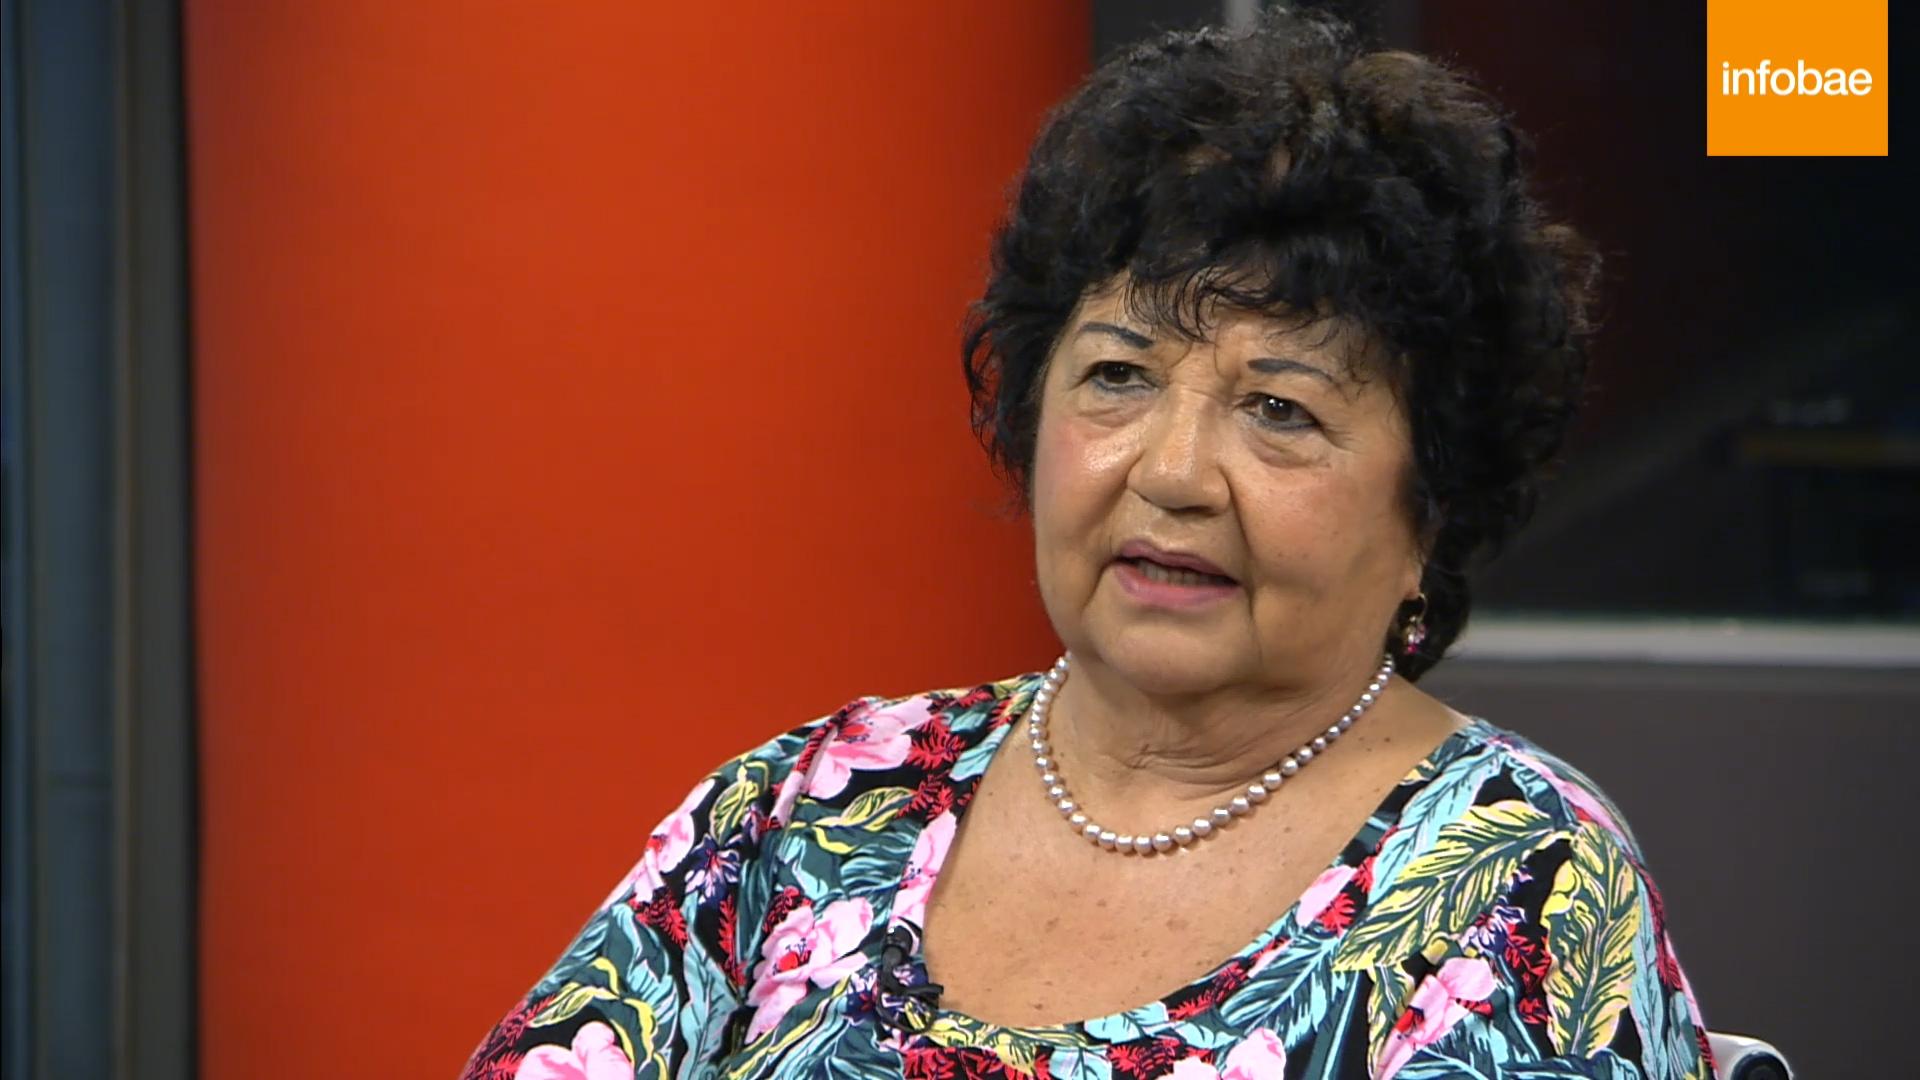 #ENTREVISTA - Dora Barrancos: historiadora y socióloga feminista